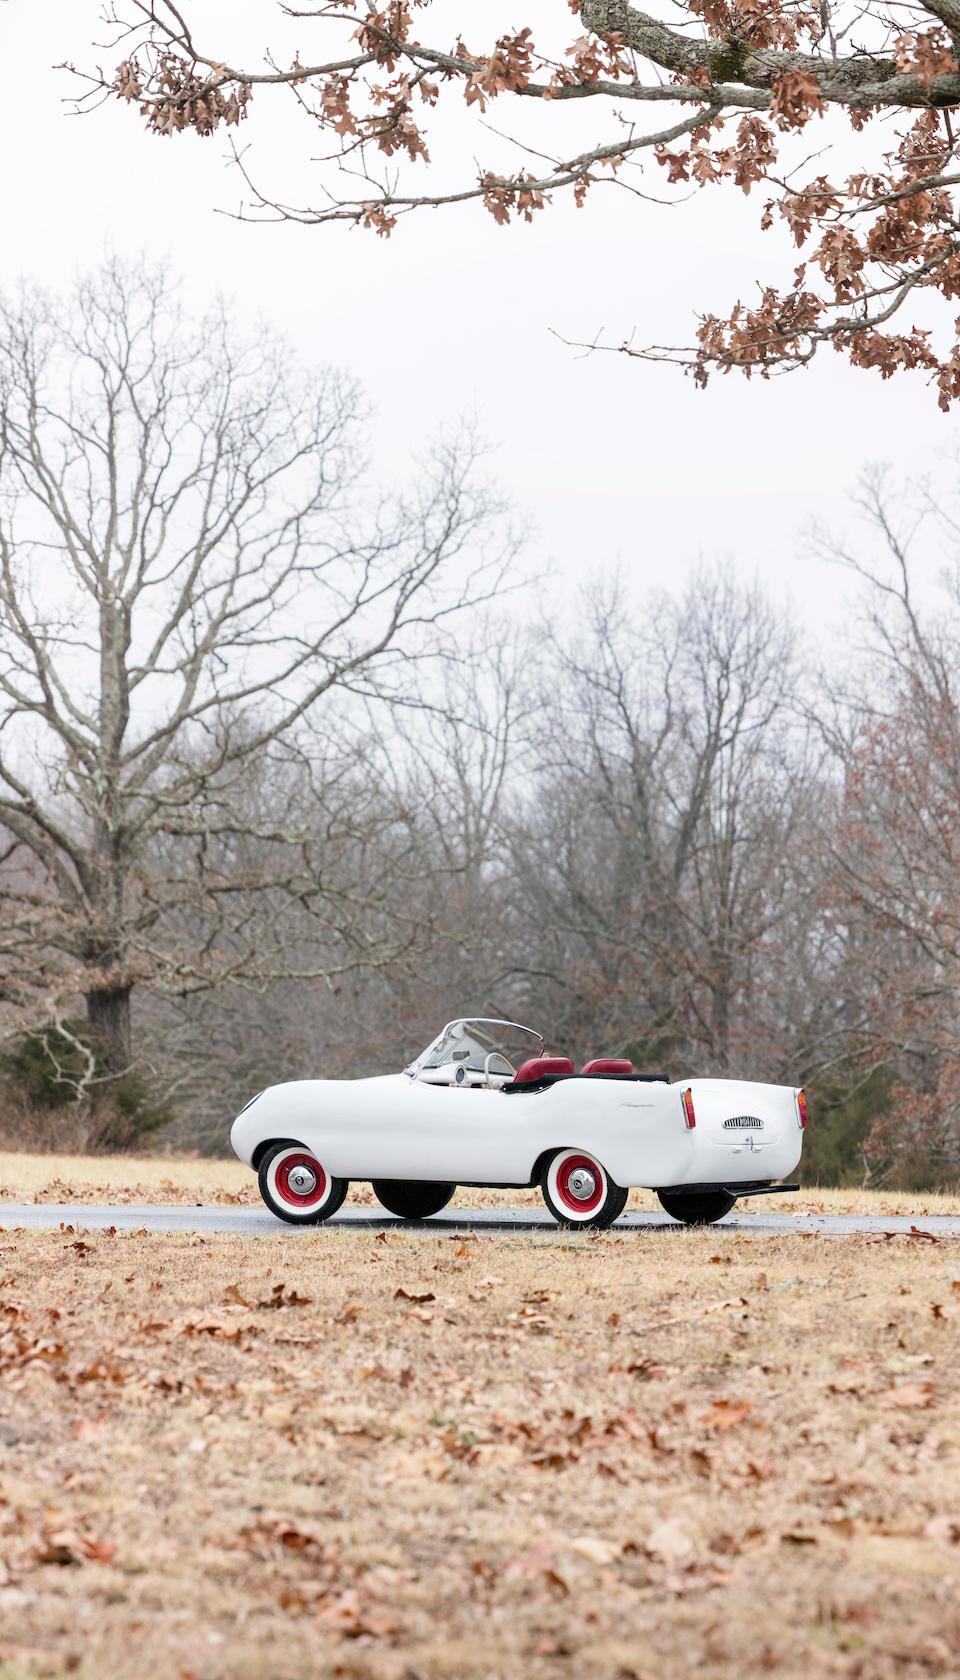 <b>1959 Goggomobil Dart Roadster</b><br />Chassis no. 0112854<br />Engine no. 02130120